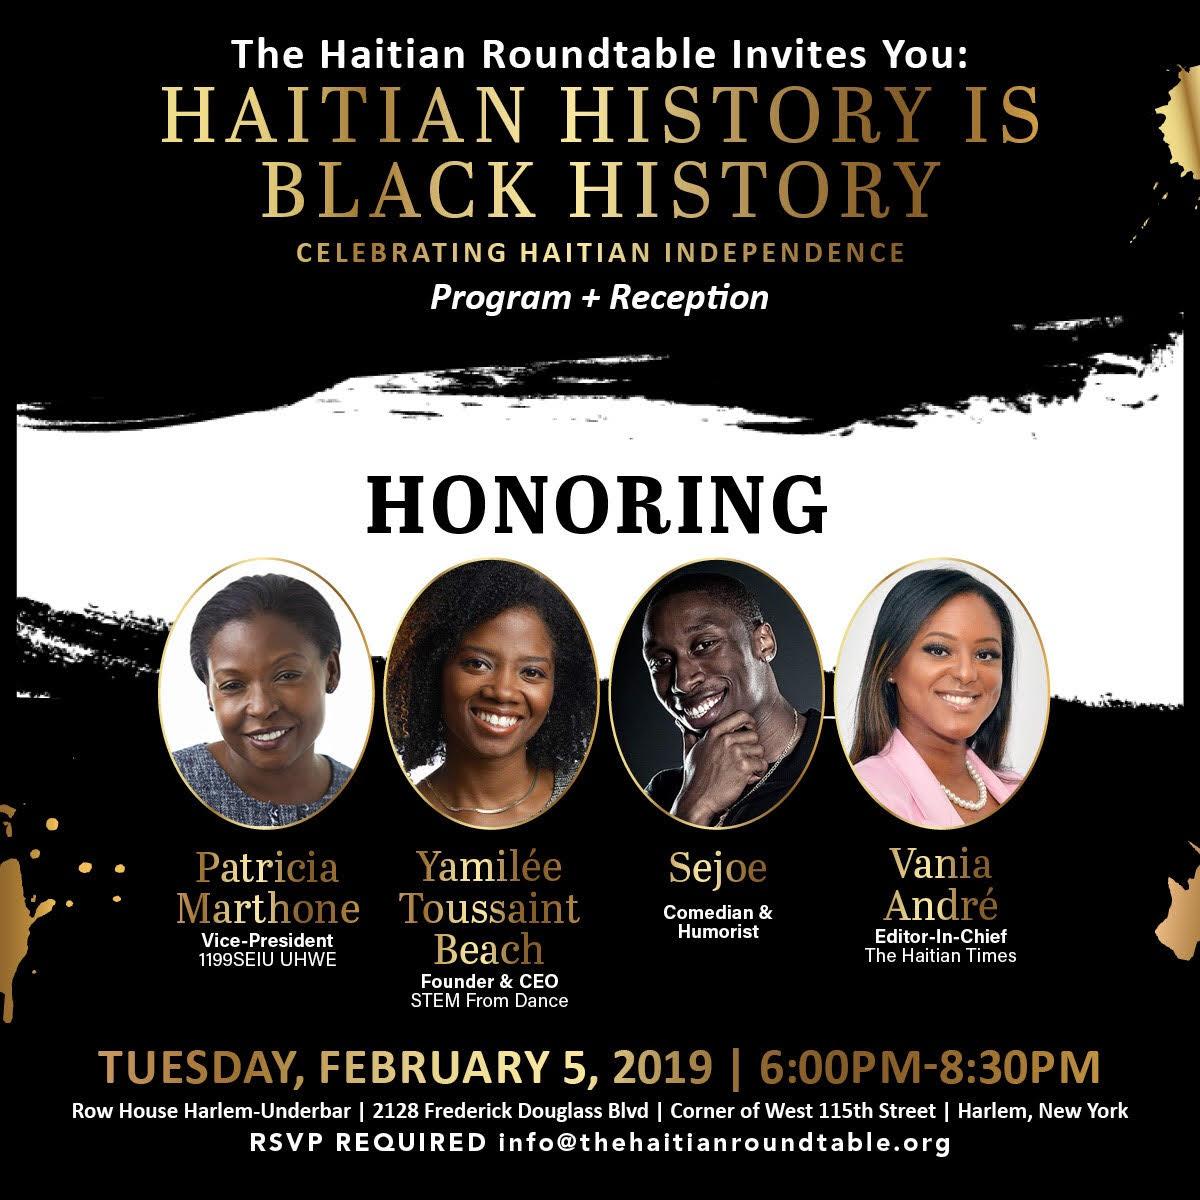 Haitian History is Black History